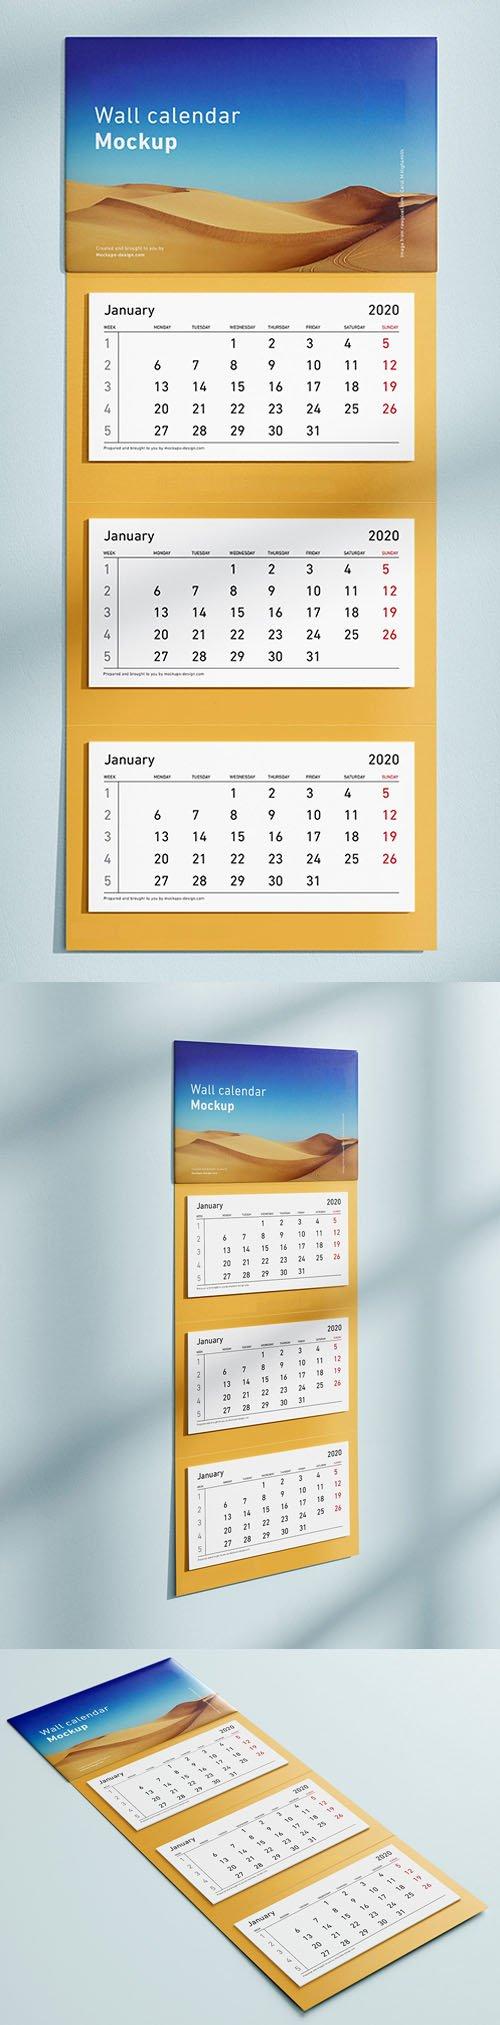 3 Panel Wall Calendar 2020 Mockup in PSD